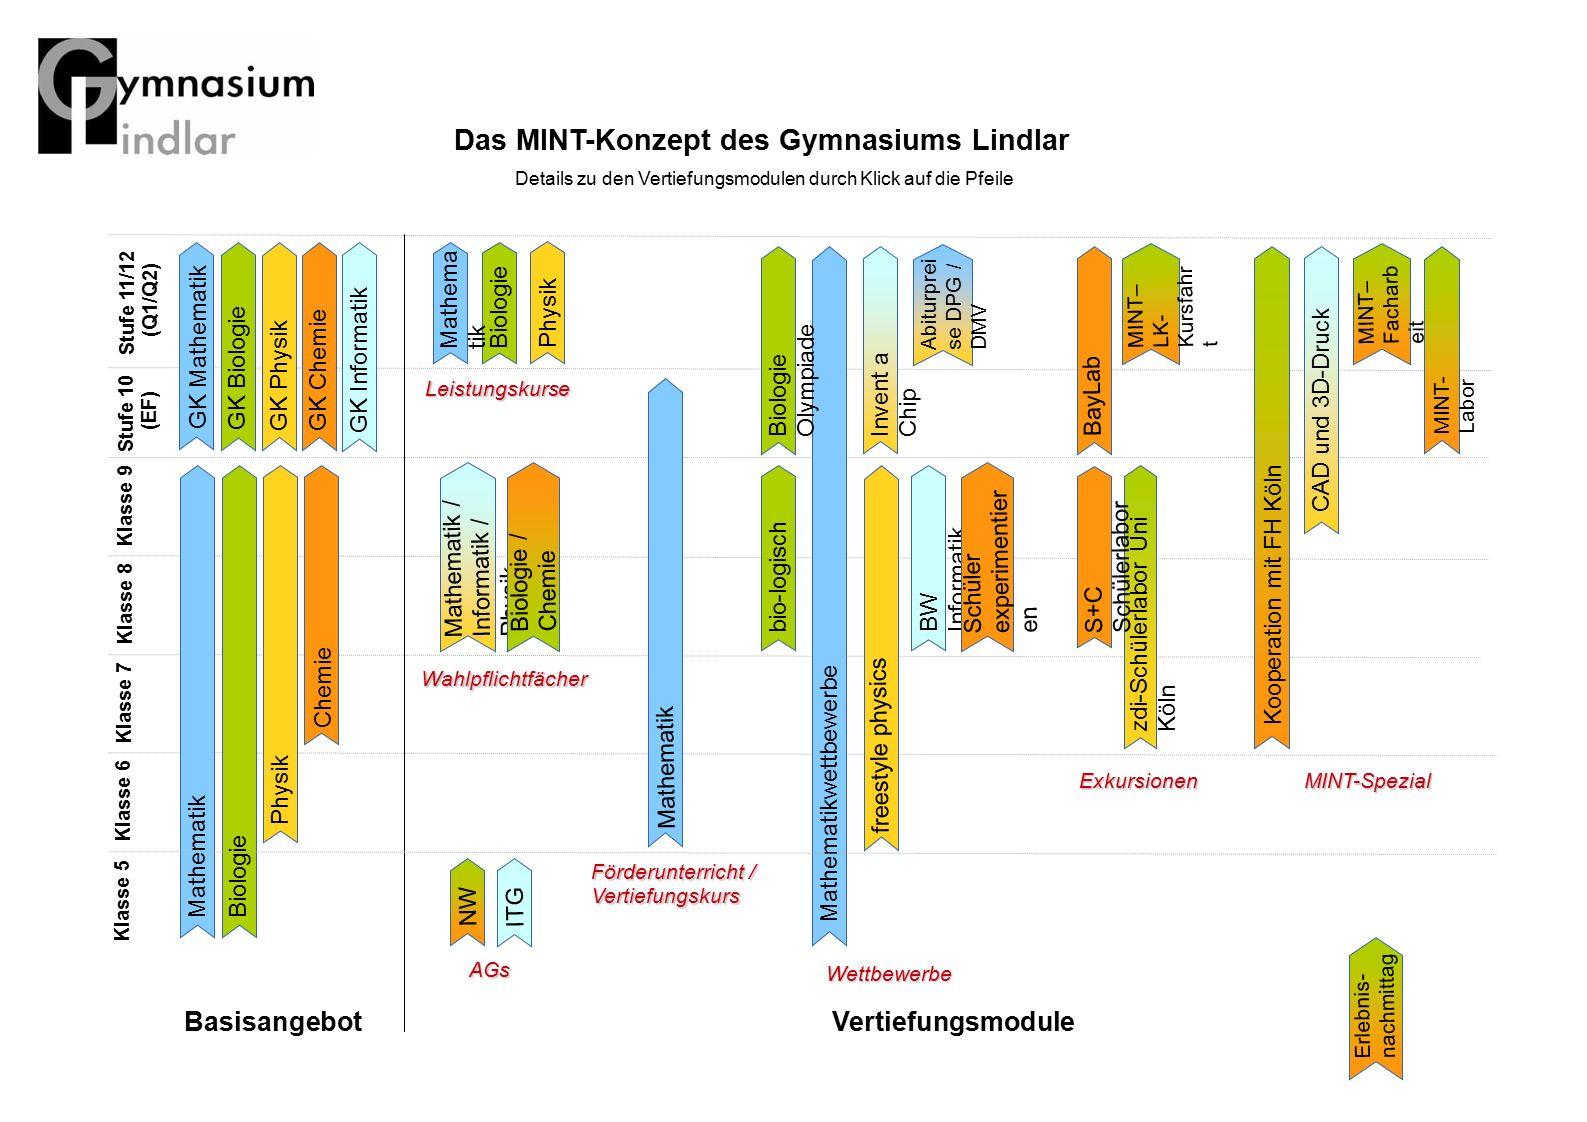 Das MINT-Konzept des Gymnasiums Lindlar